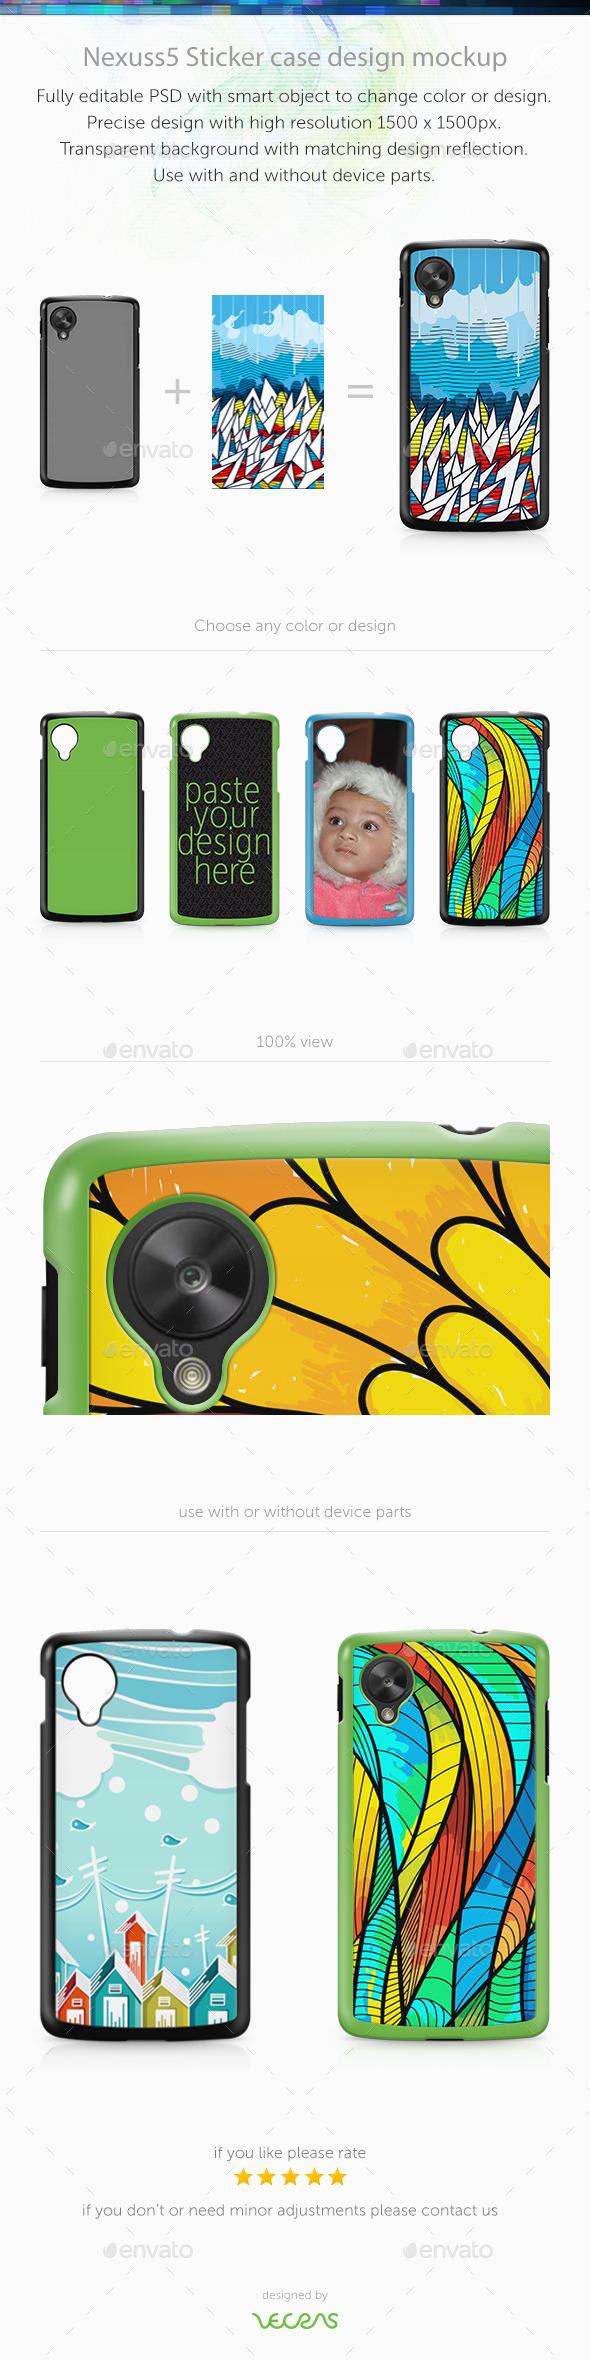 Nexuss 5 Sticker Case Design Mockup - Mobile Displays